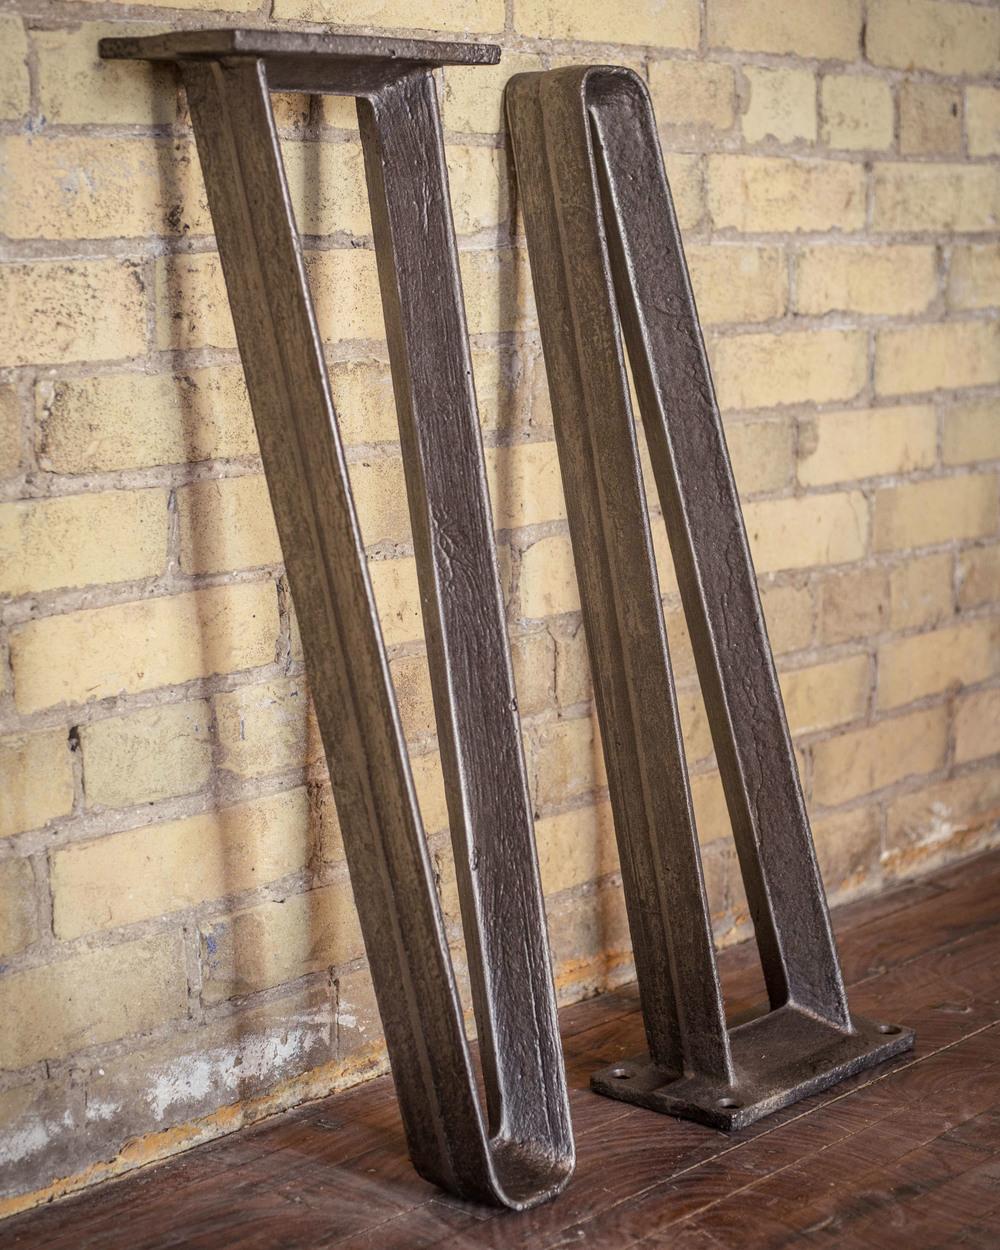 stacklab-design-custom-furniture-table-legs-cast.jpg